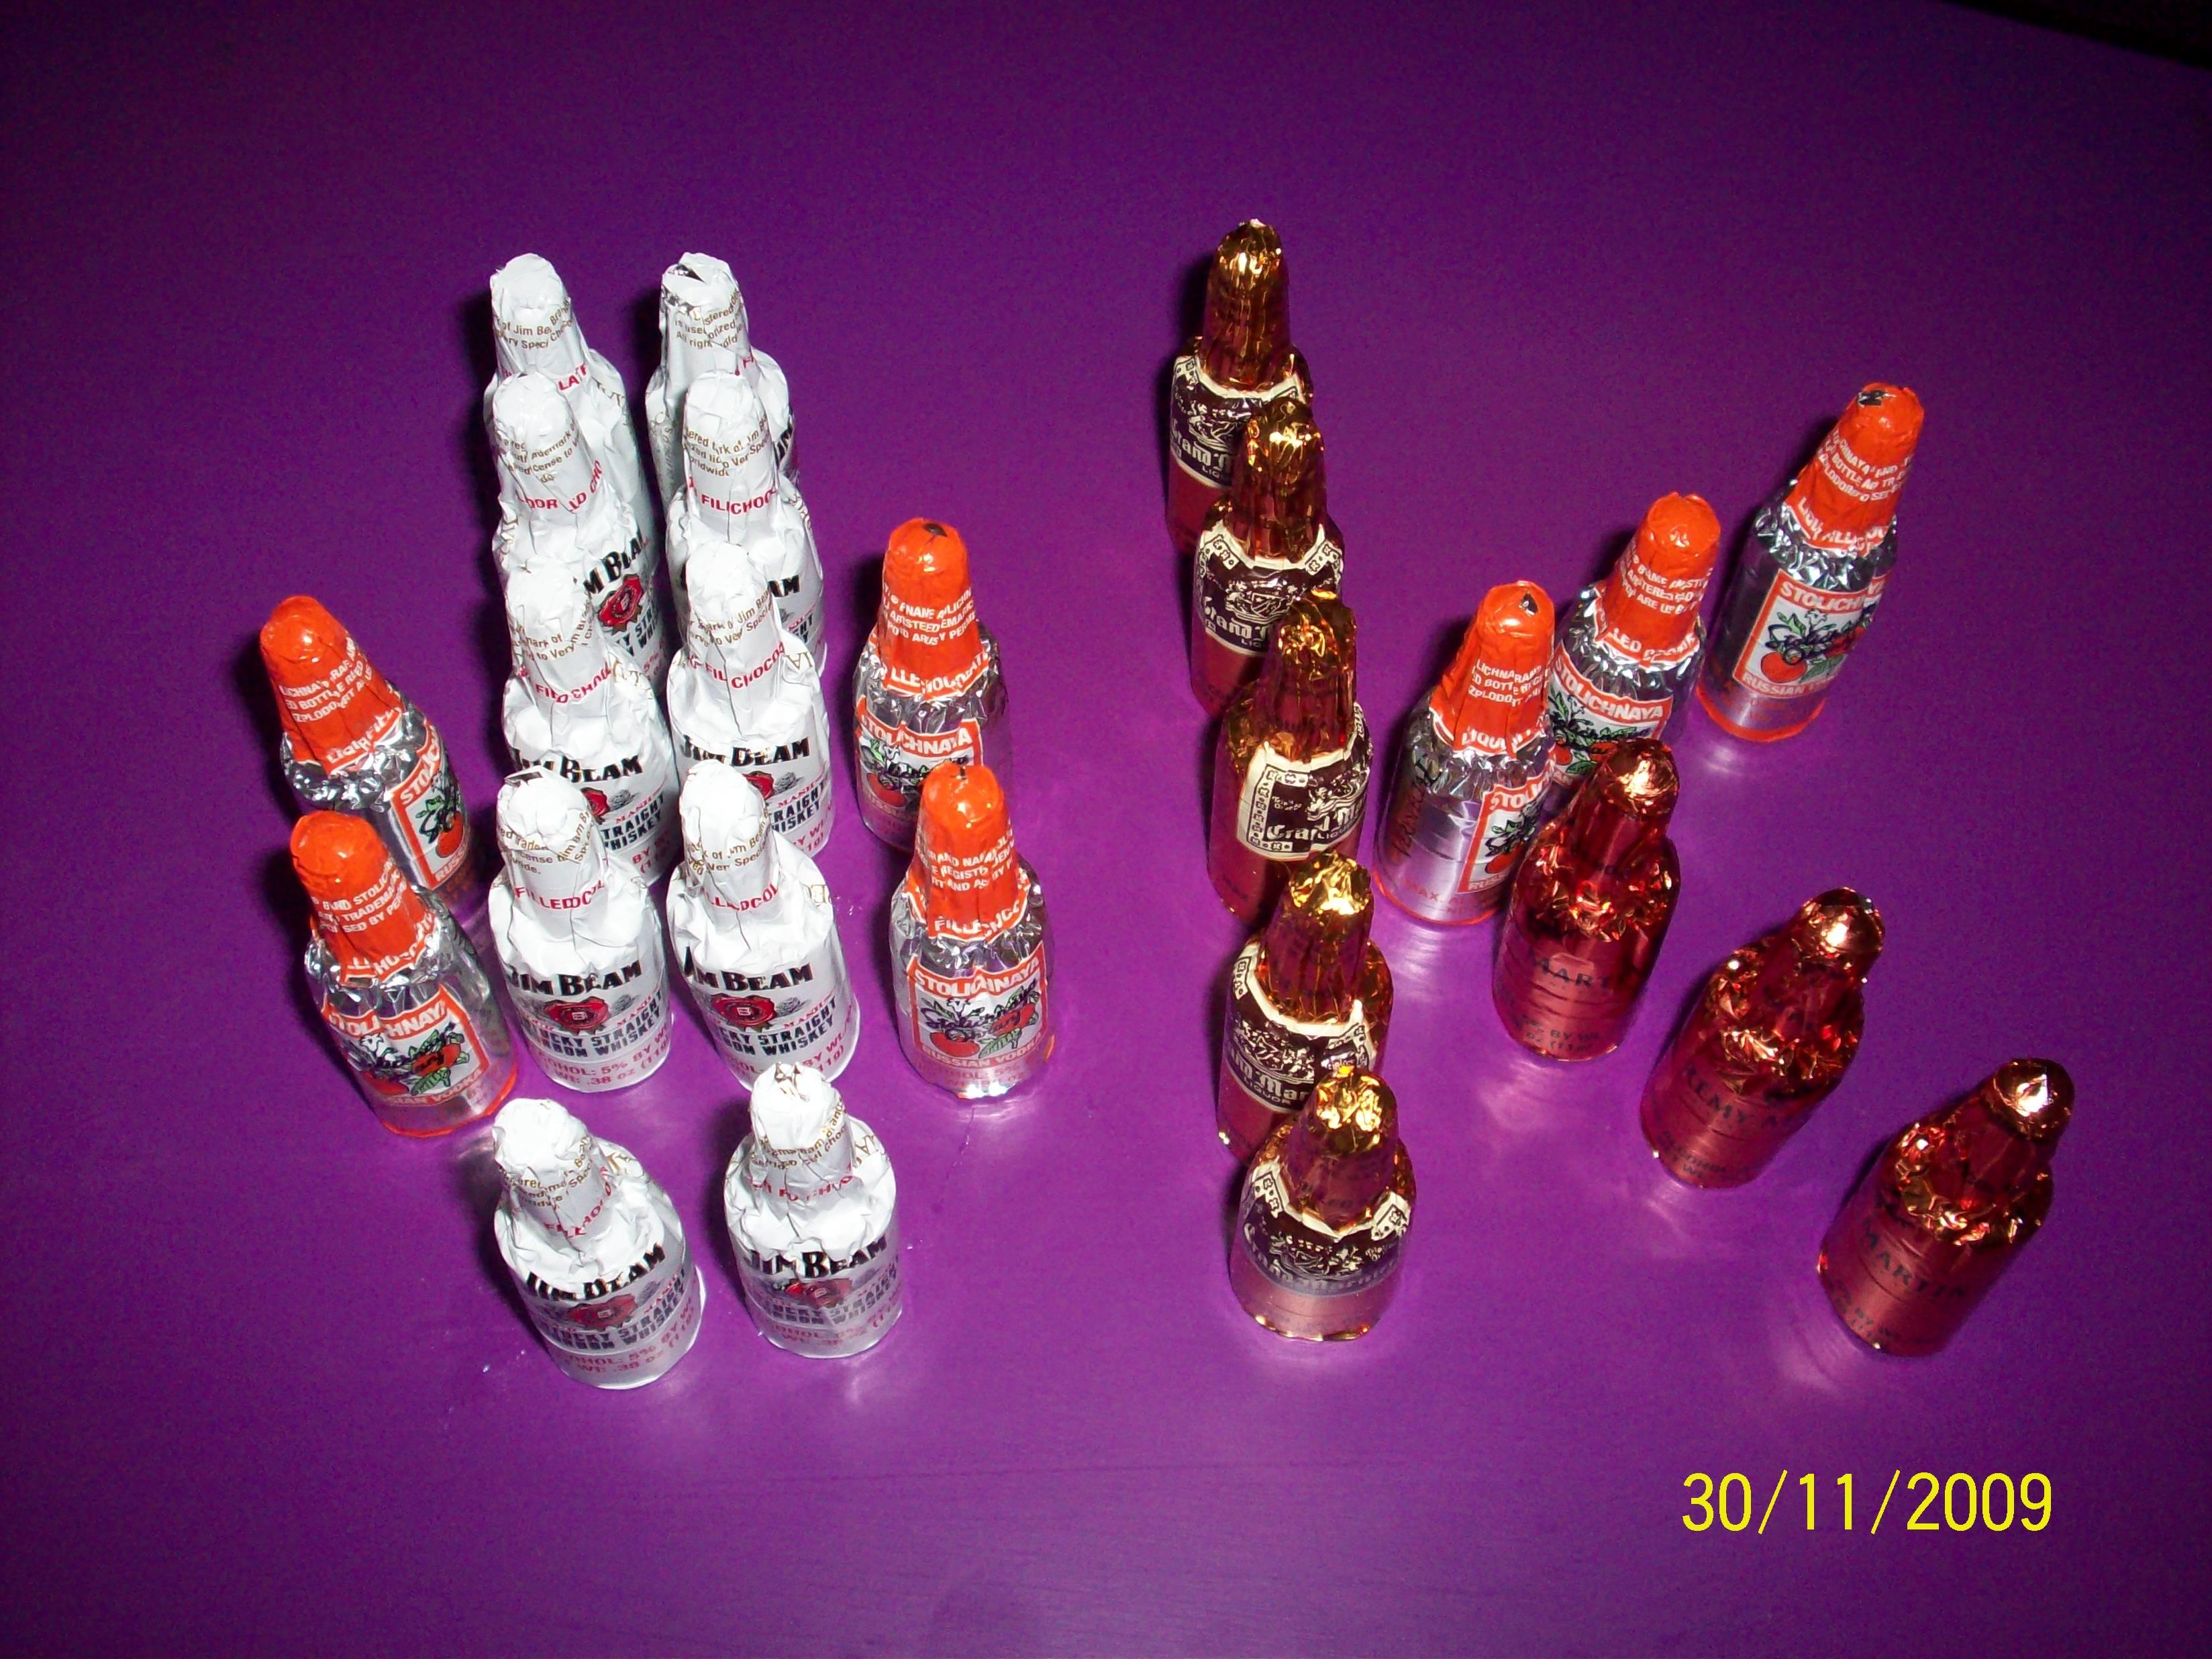 http://foodloader.net/cutie_2009-11-30_Liquor_Filled_Chocolates_-_k.jpg